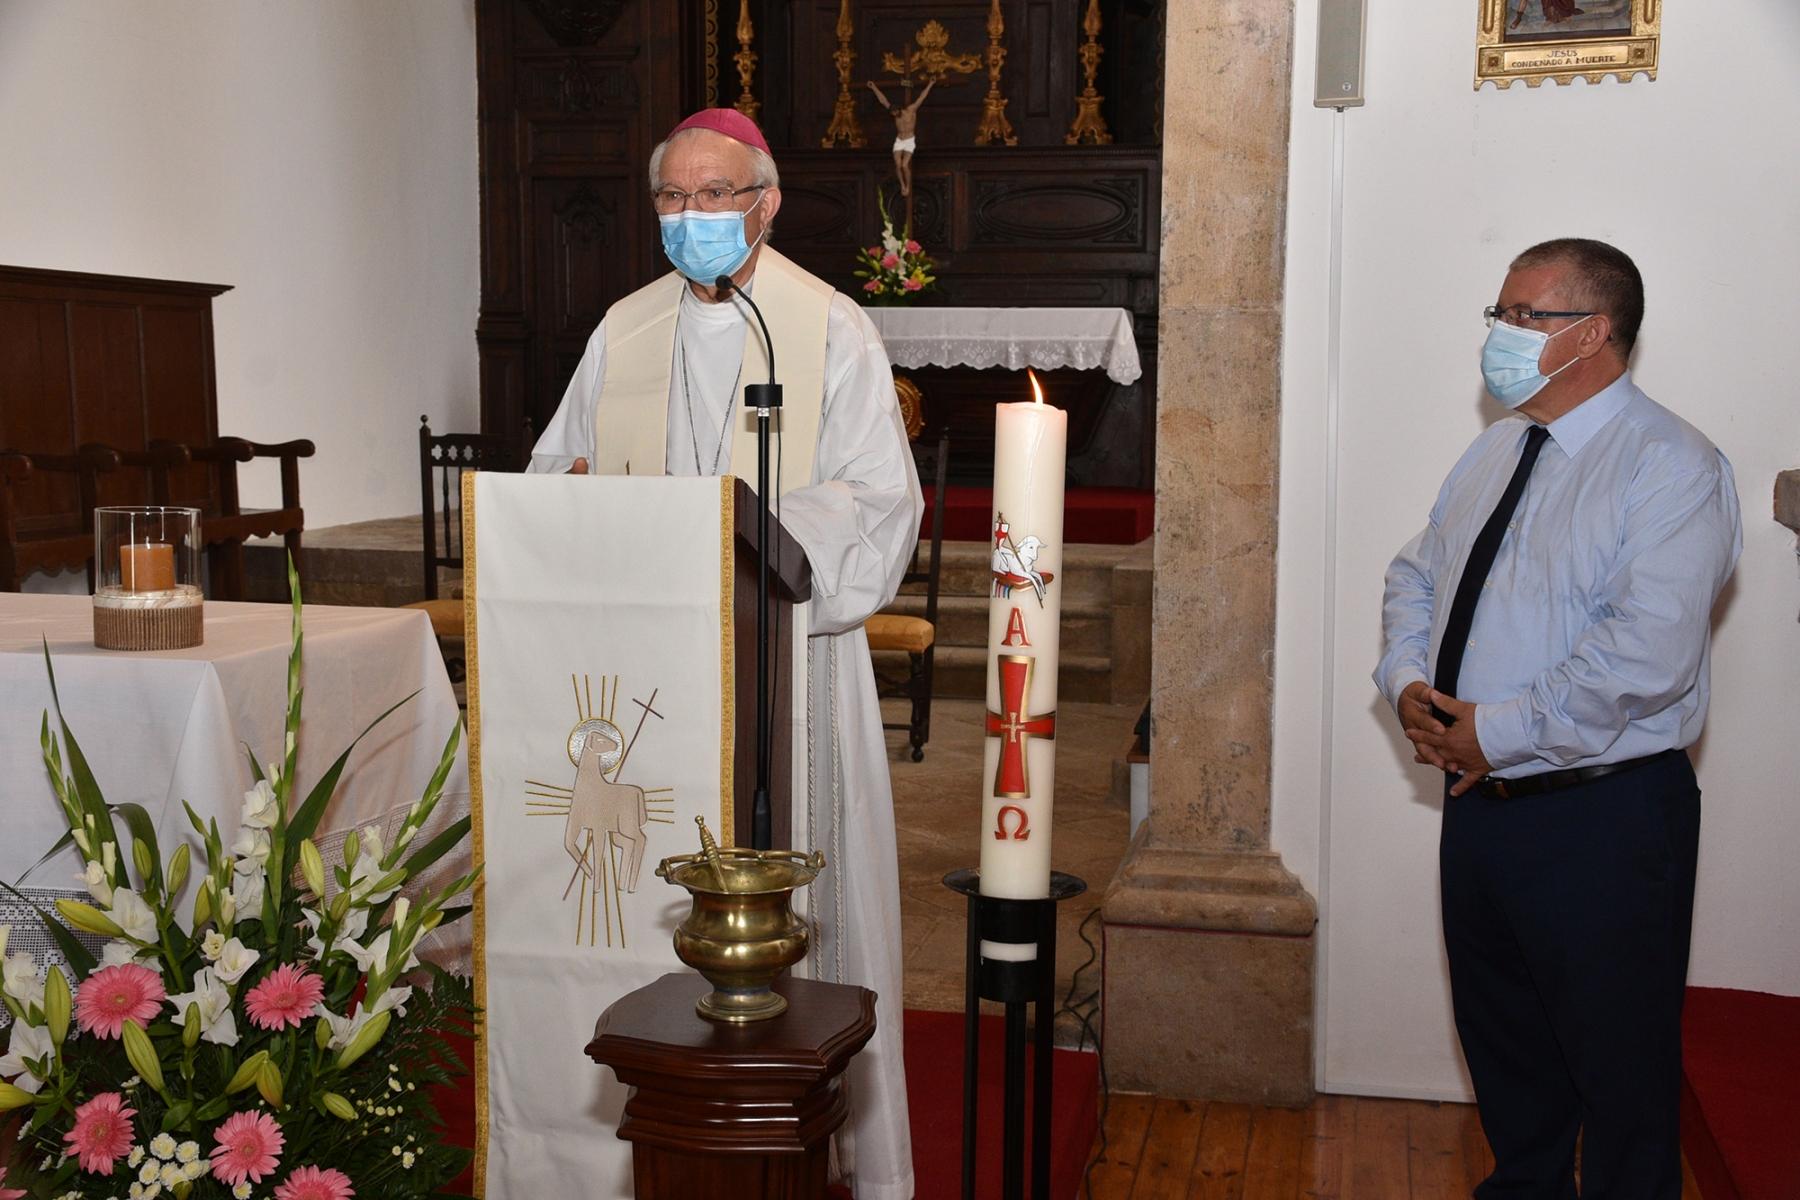 Inauguracao_bencao_obras_restauro_igreja_alcoutim-26